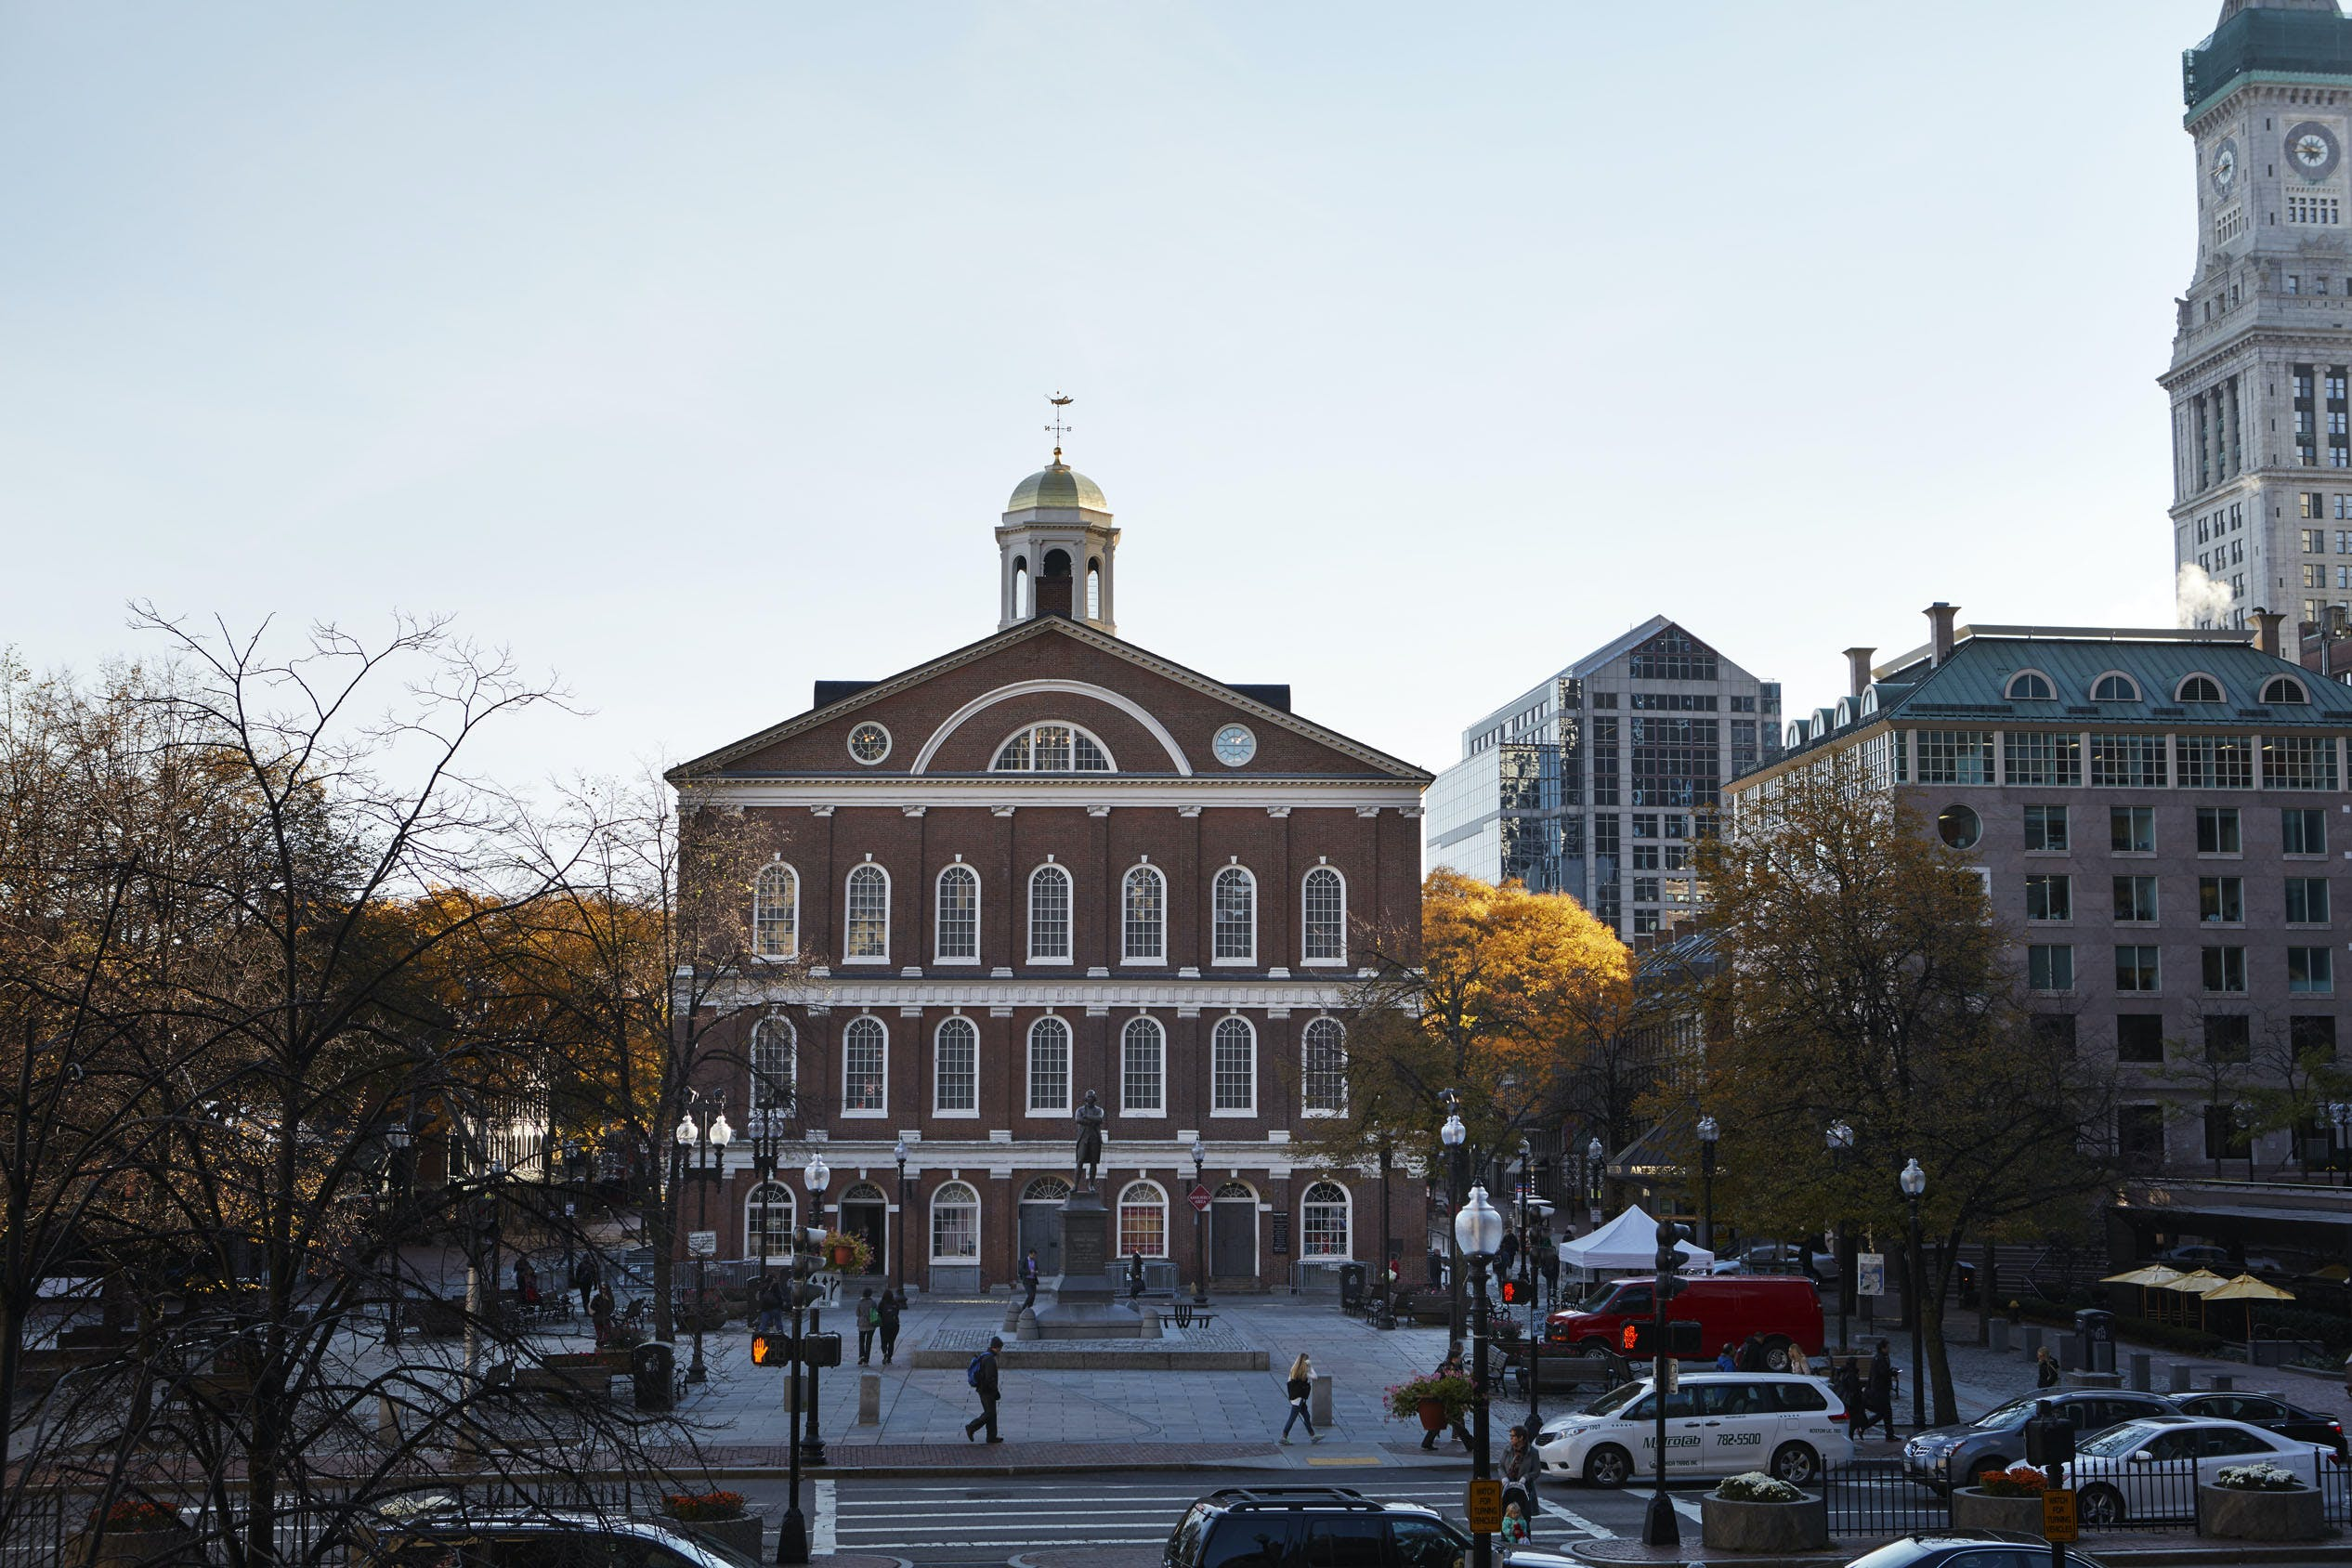 Faneuil Hall Marketplace, Boston, MA